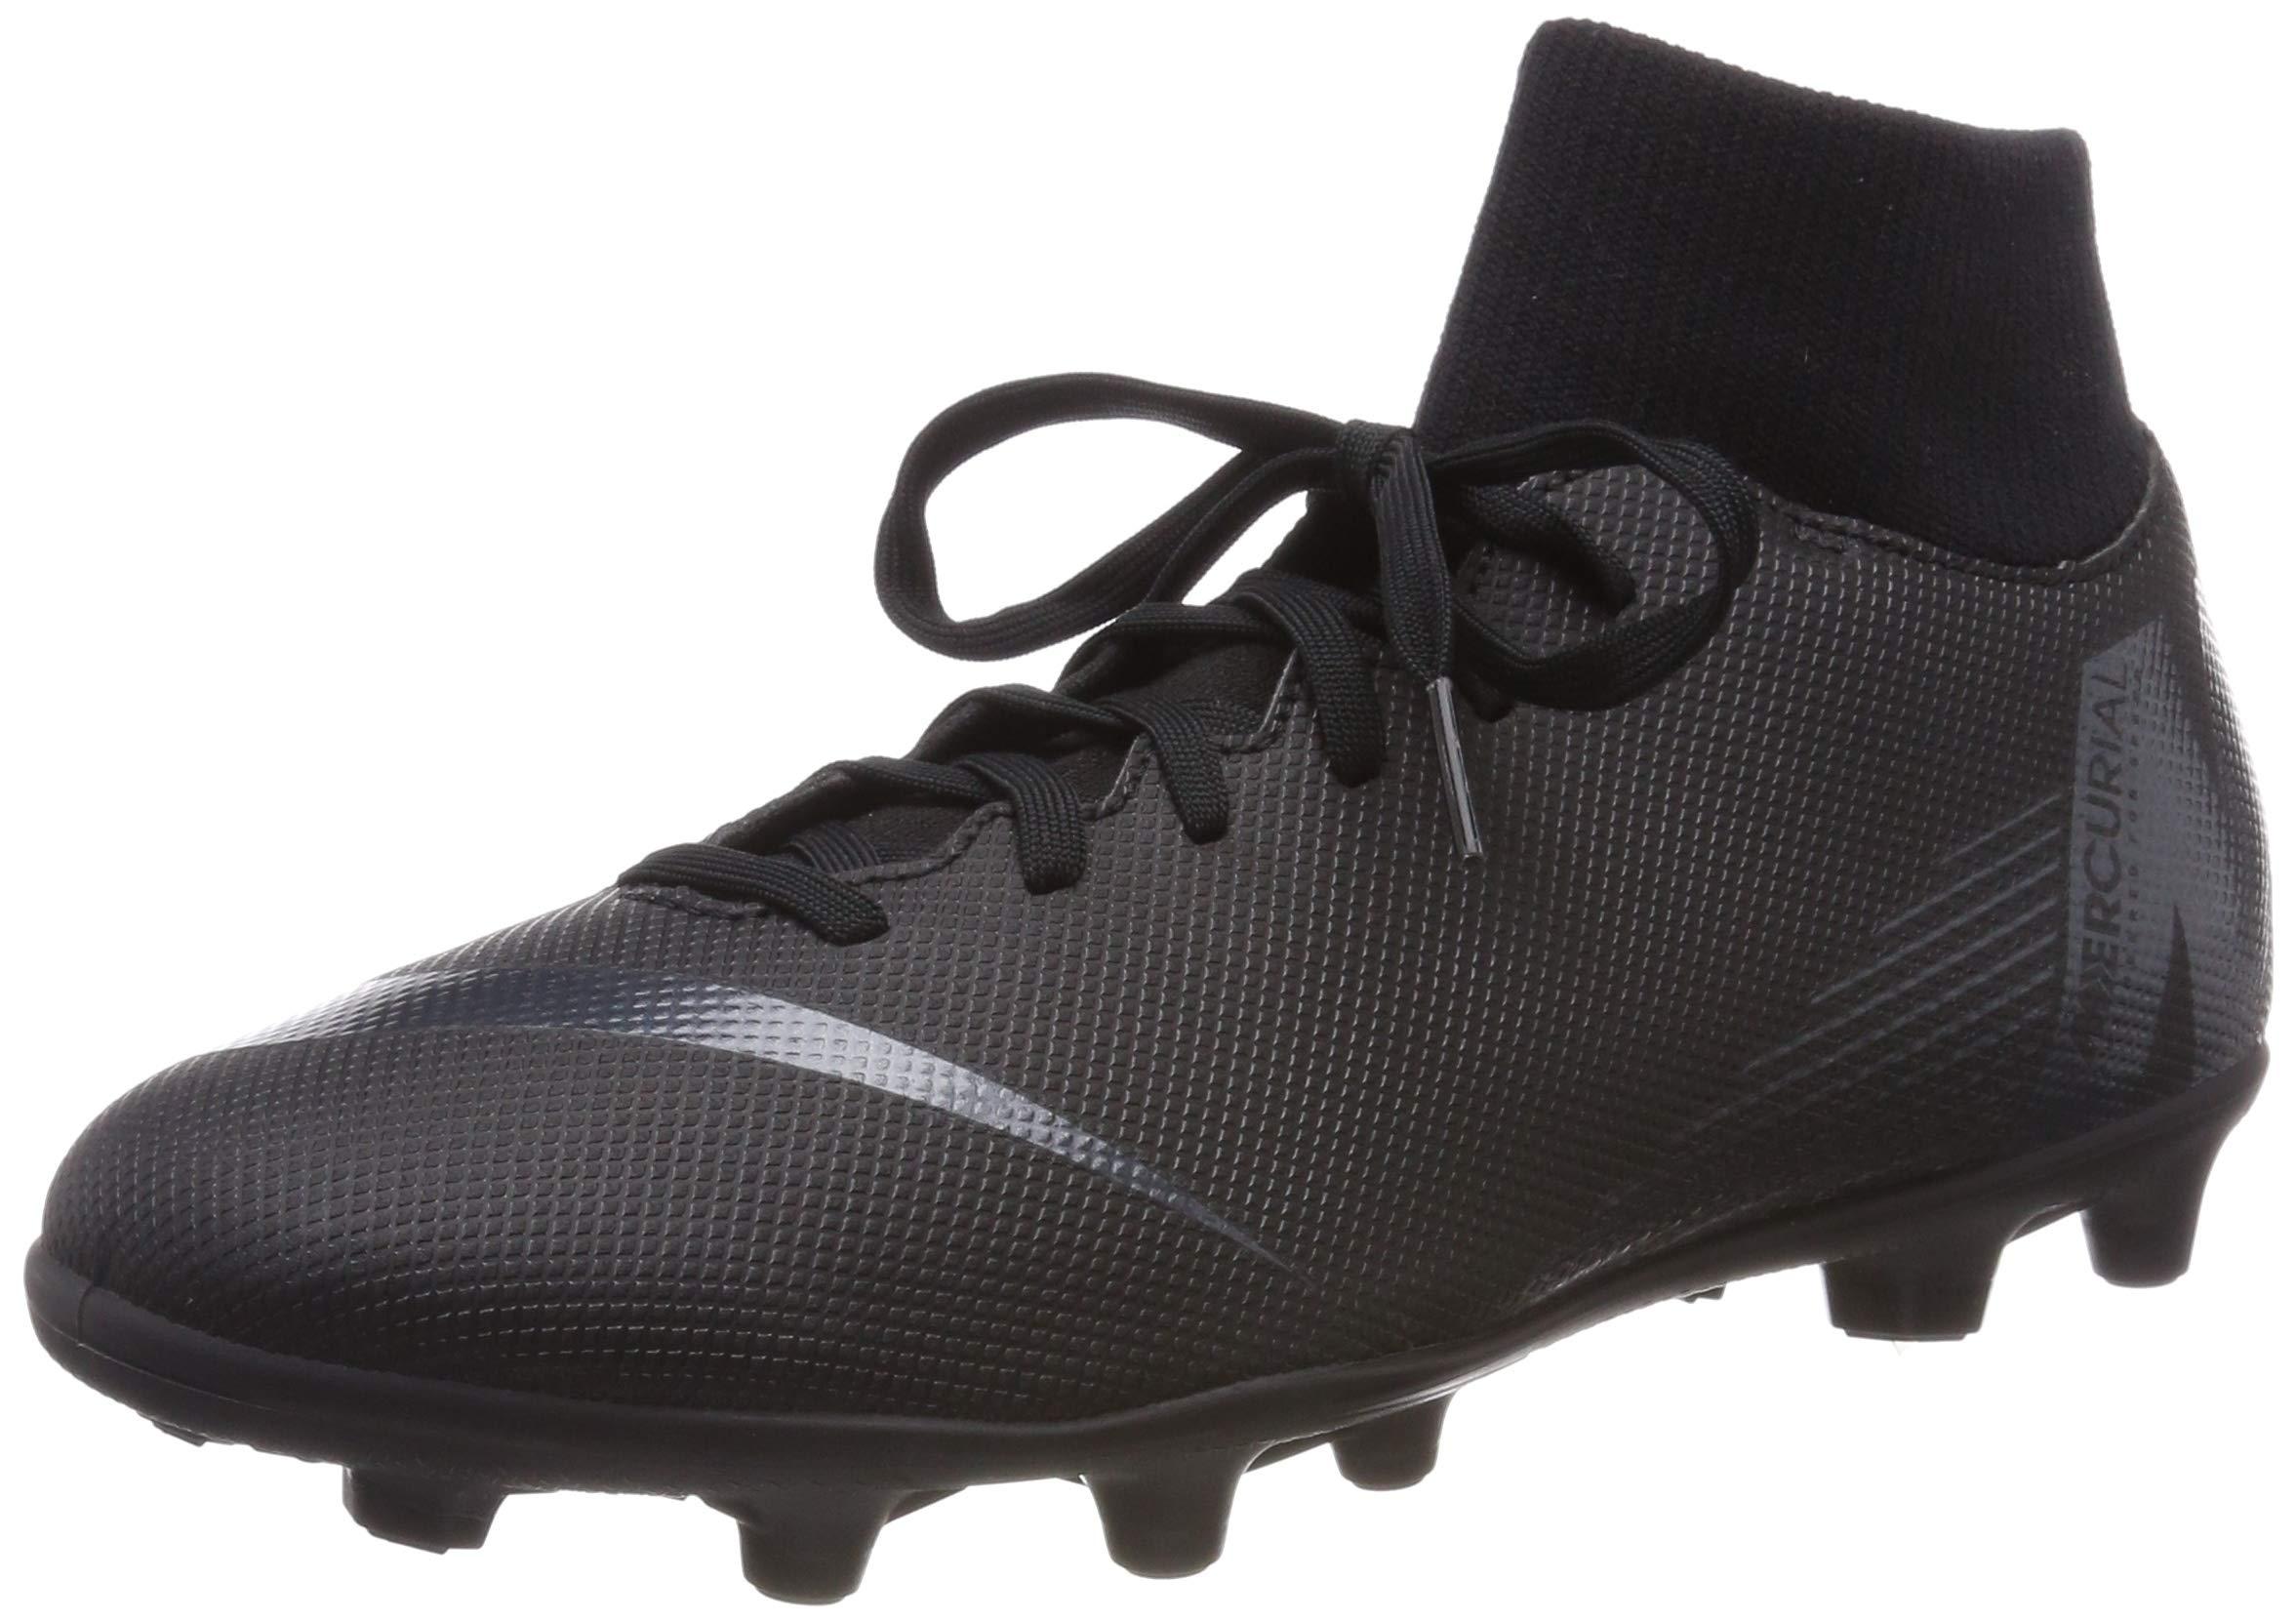 Nike Mercurial Superfly 6 Club MG Soccer Cleats (6, Black/Black)